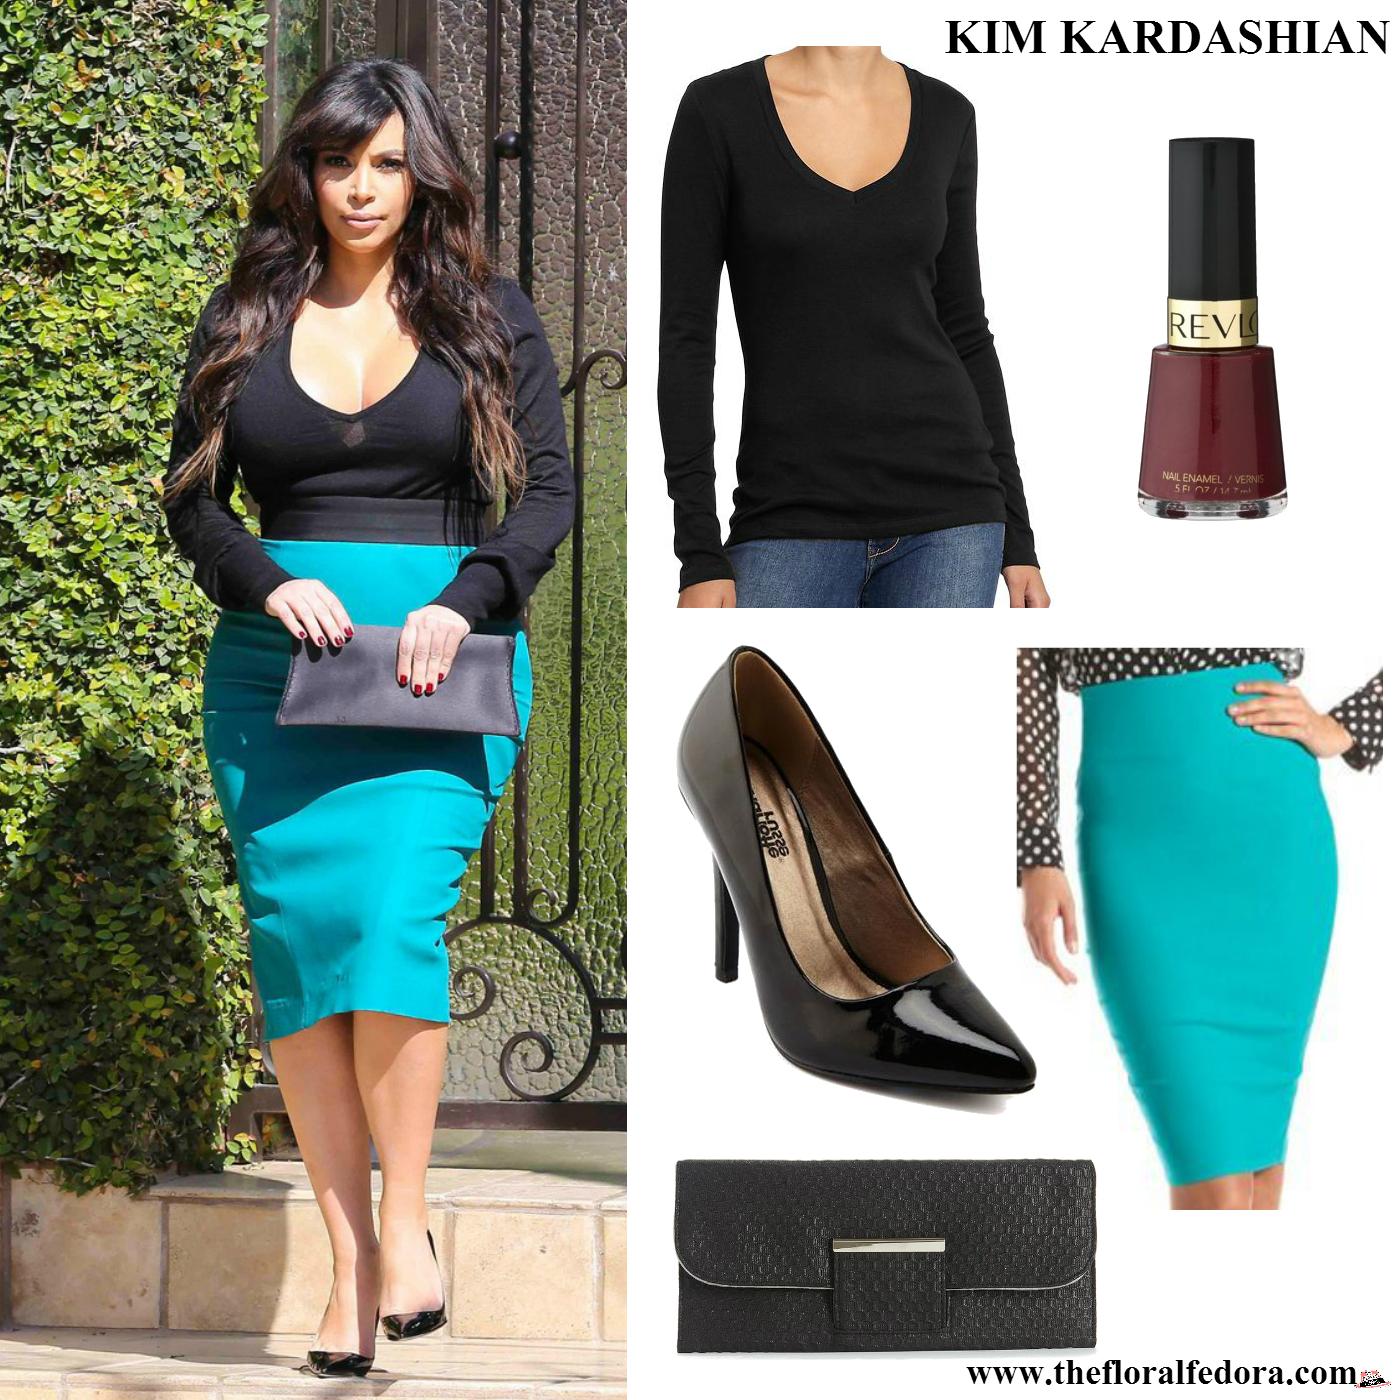 Kim Kardashian Beverly Hills March 2013 The Floral Fedora